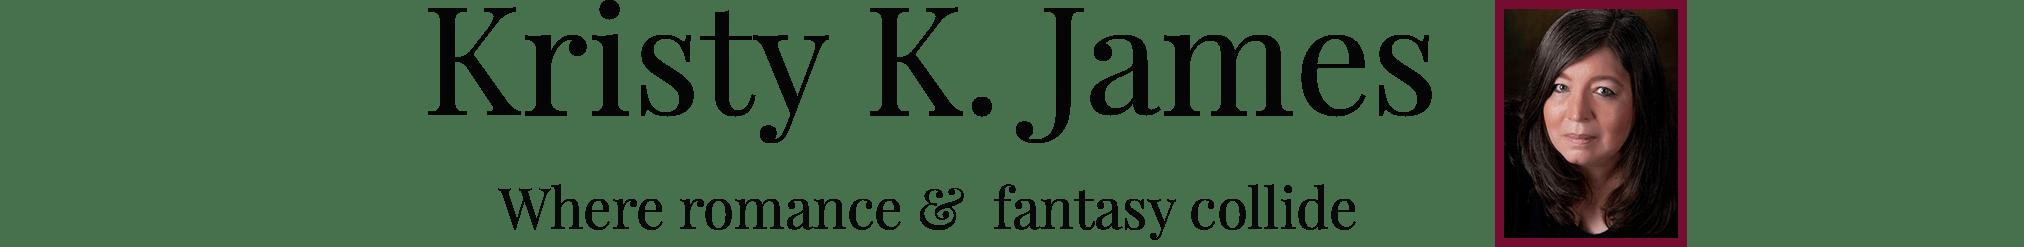 Kristy K James, Author